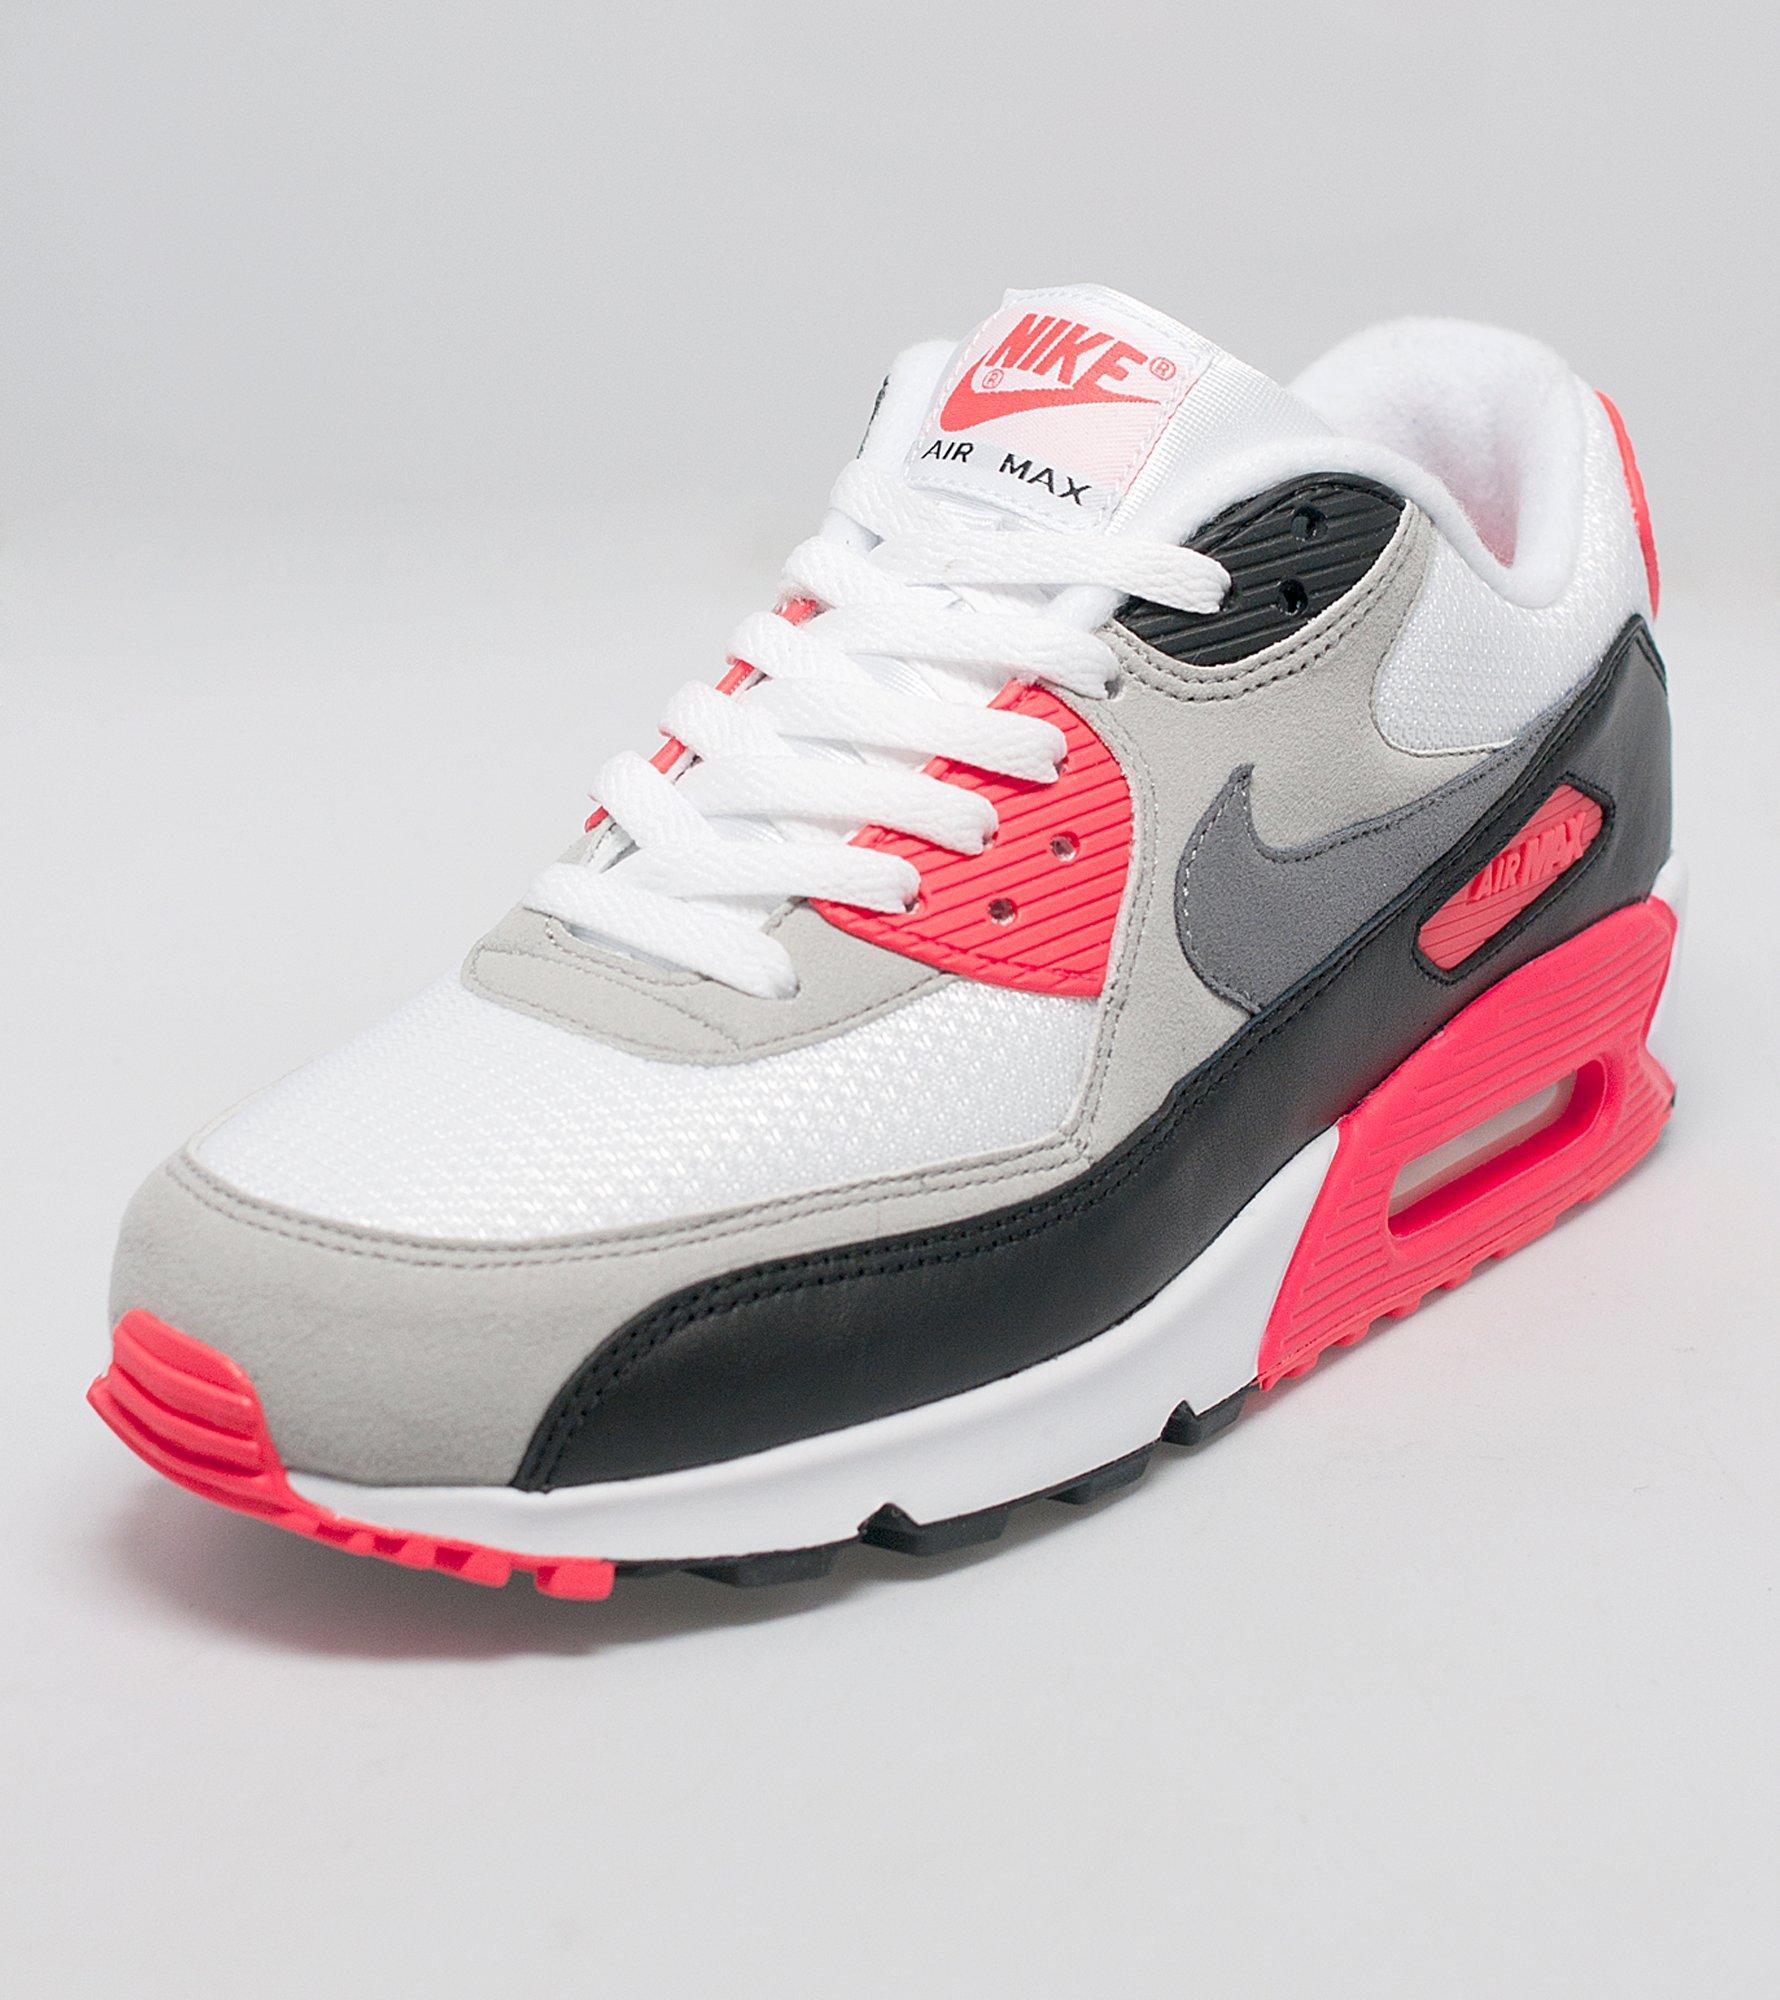 separation shoes 0f7f8 c676f nike sb plum size 13